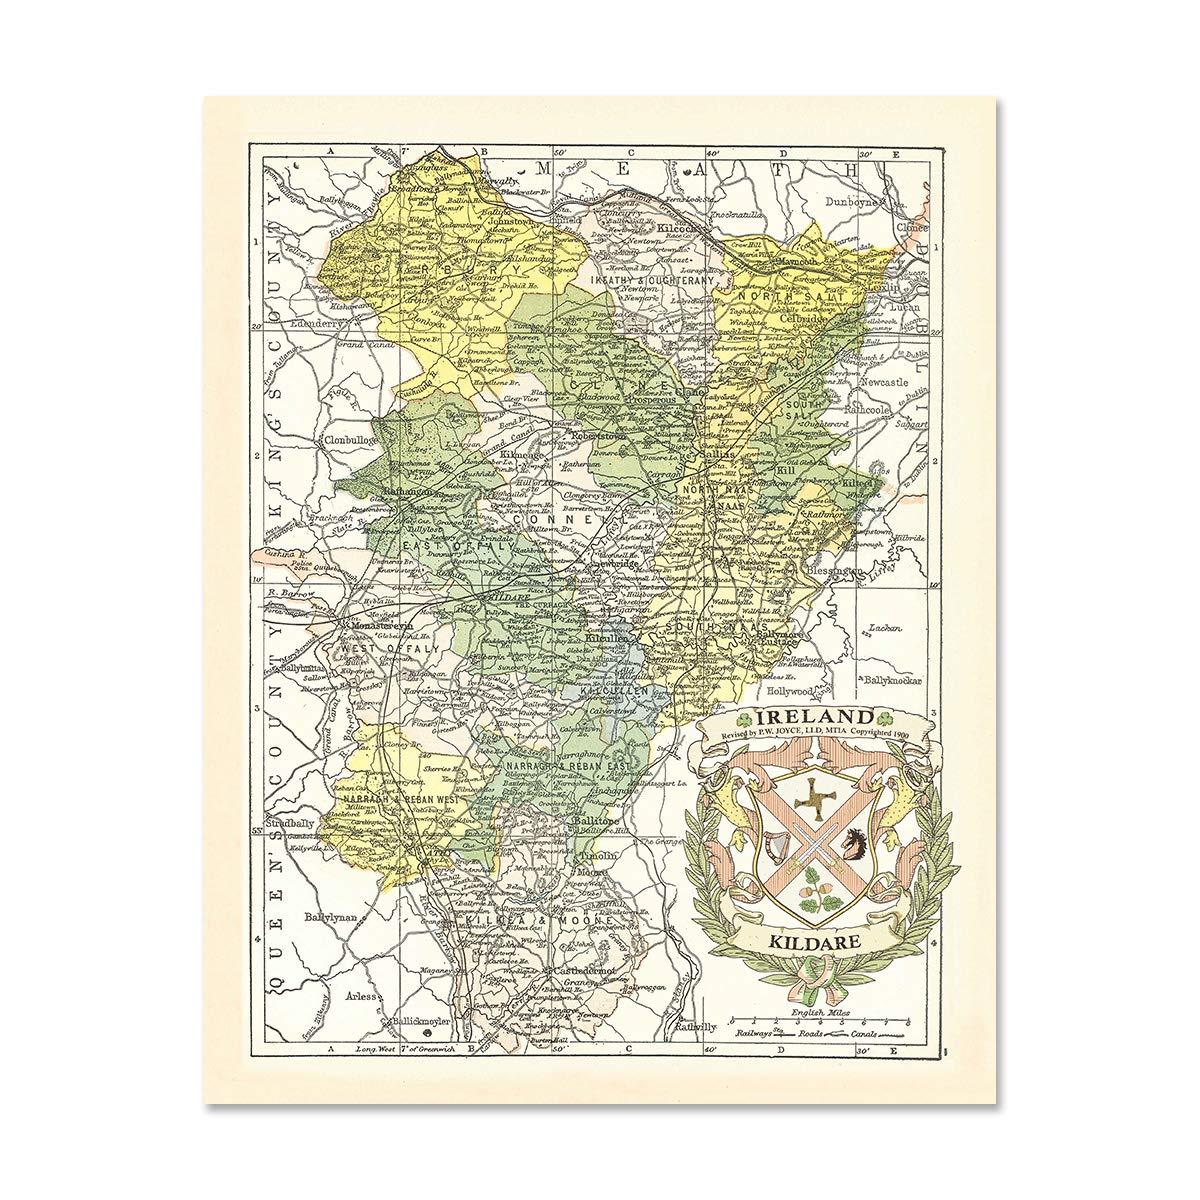 Amazon Com Historic Families Kildare County Map Of Ireland Antique